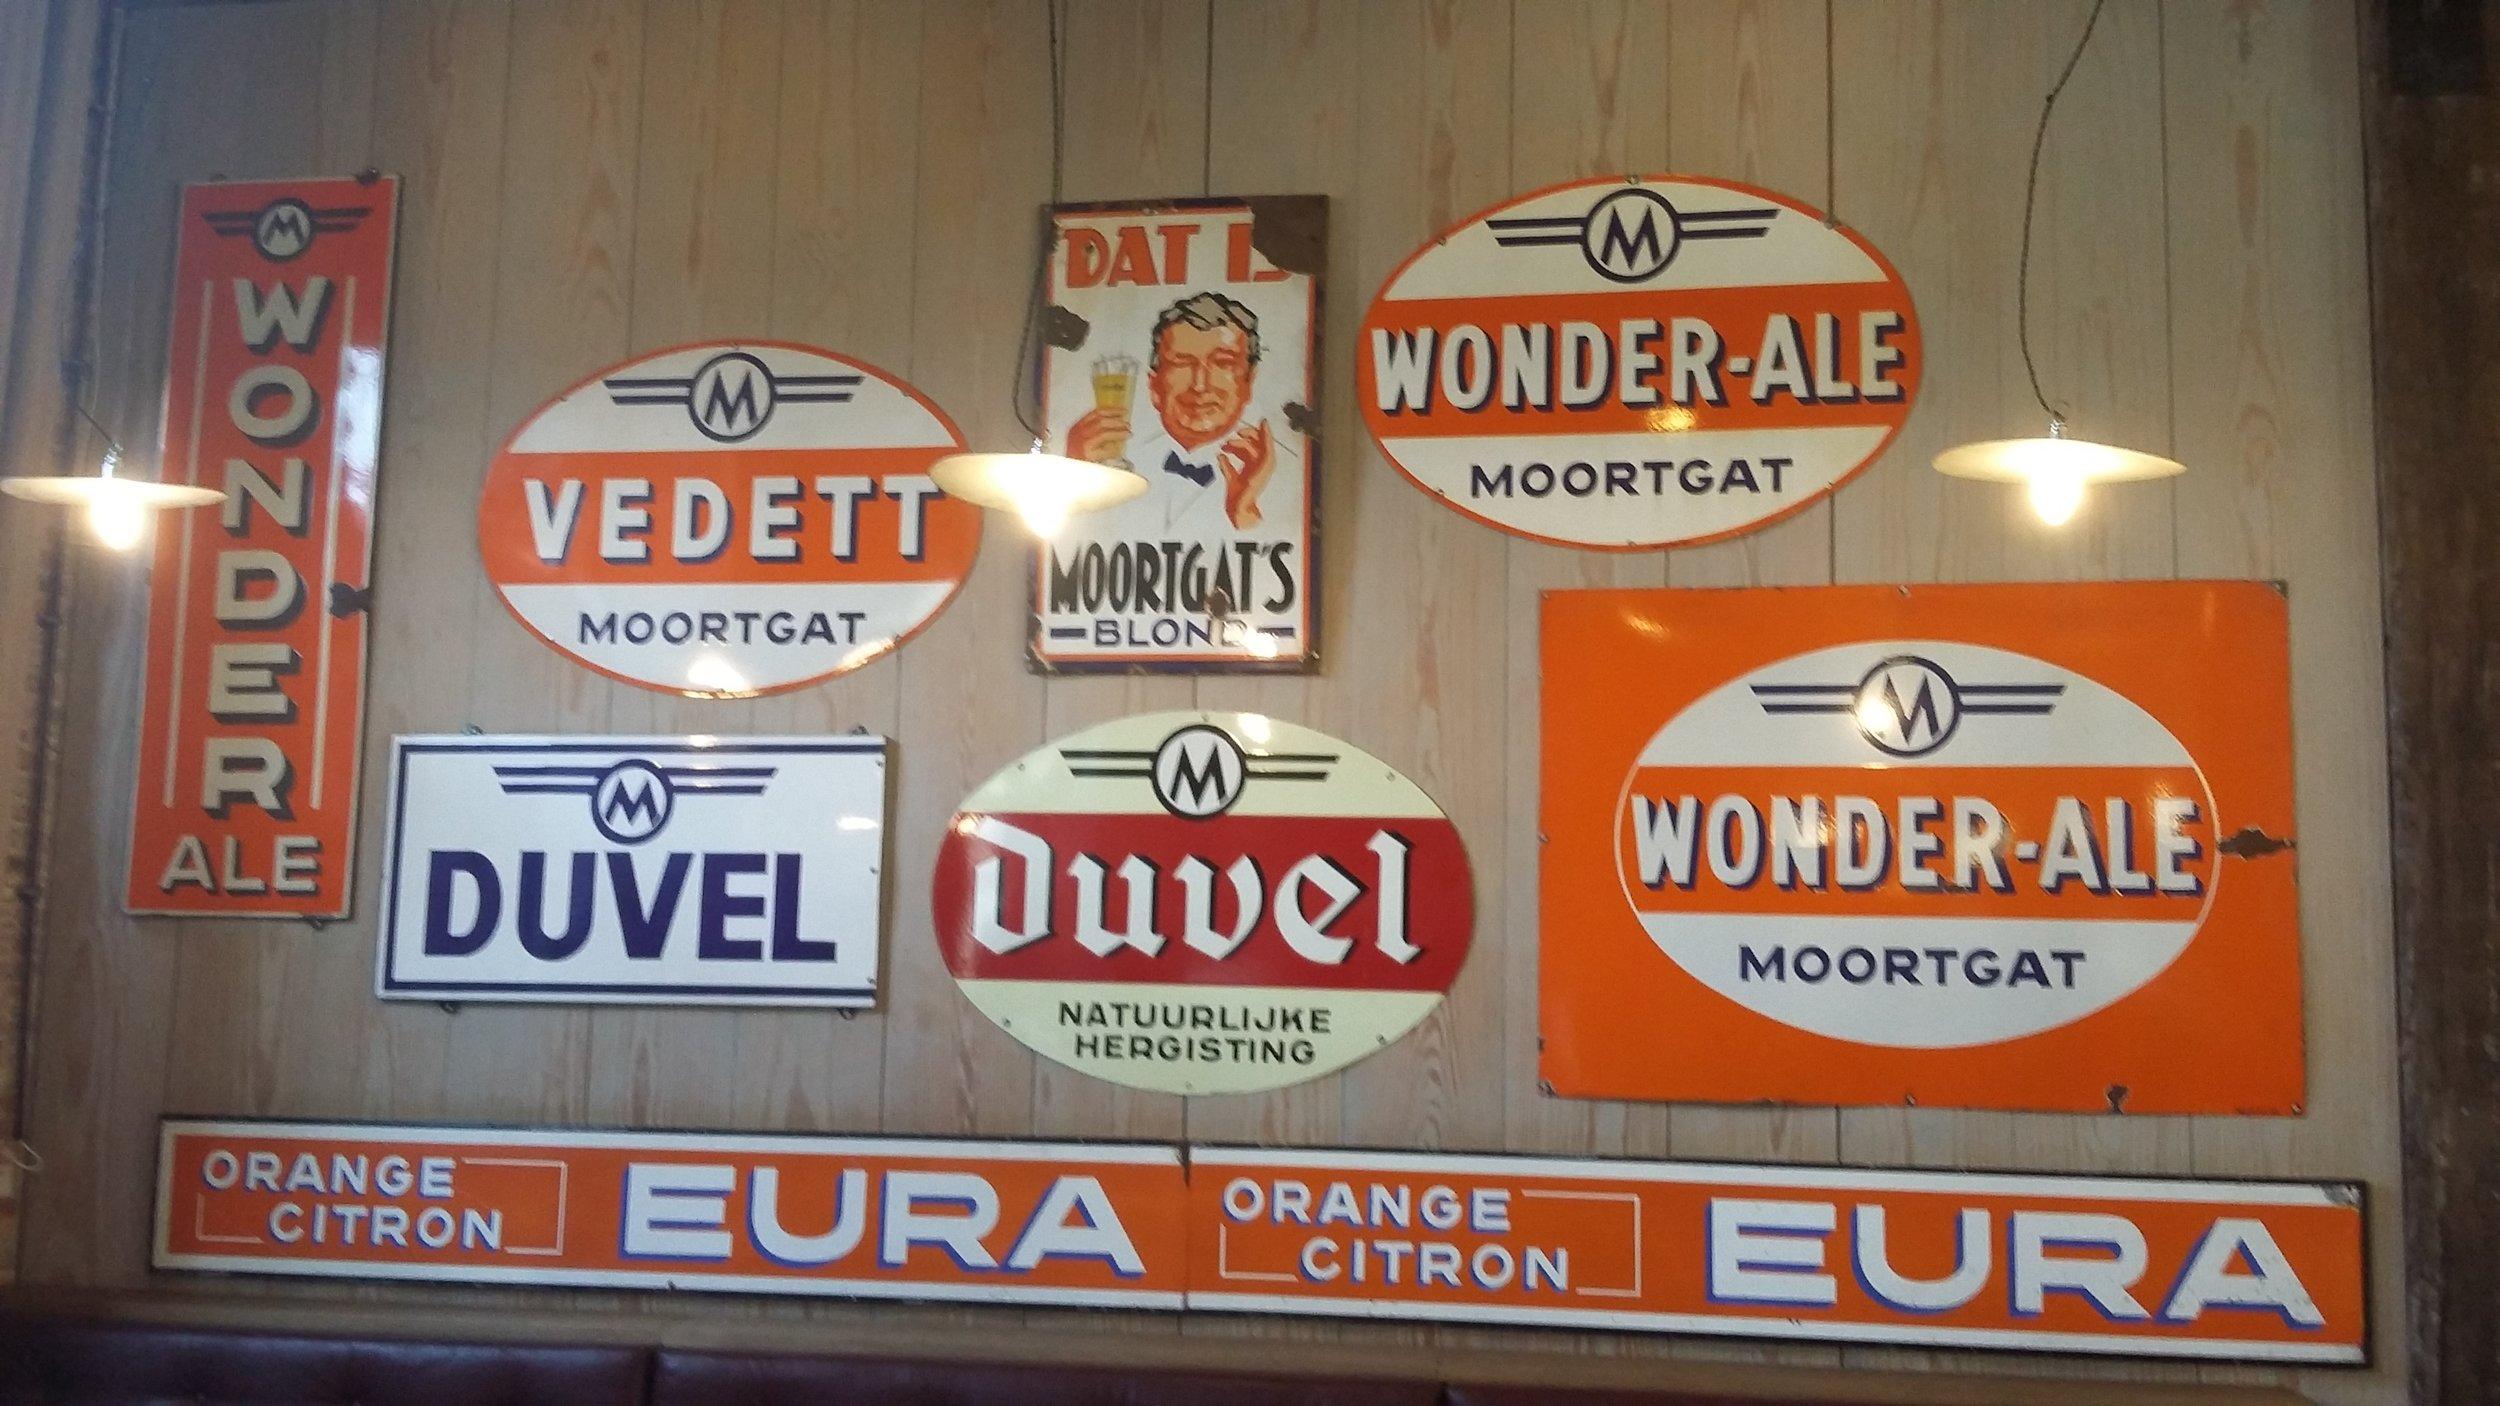 Classic advertising at Duvel tasting room